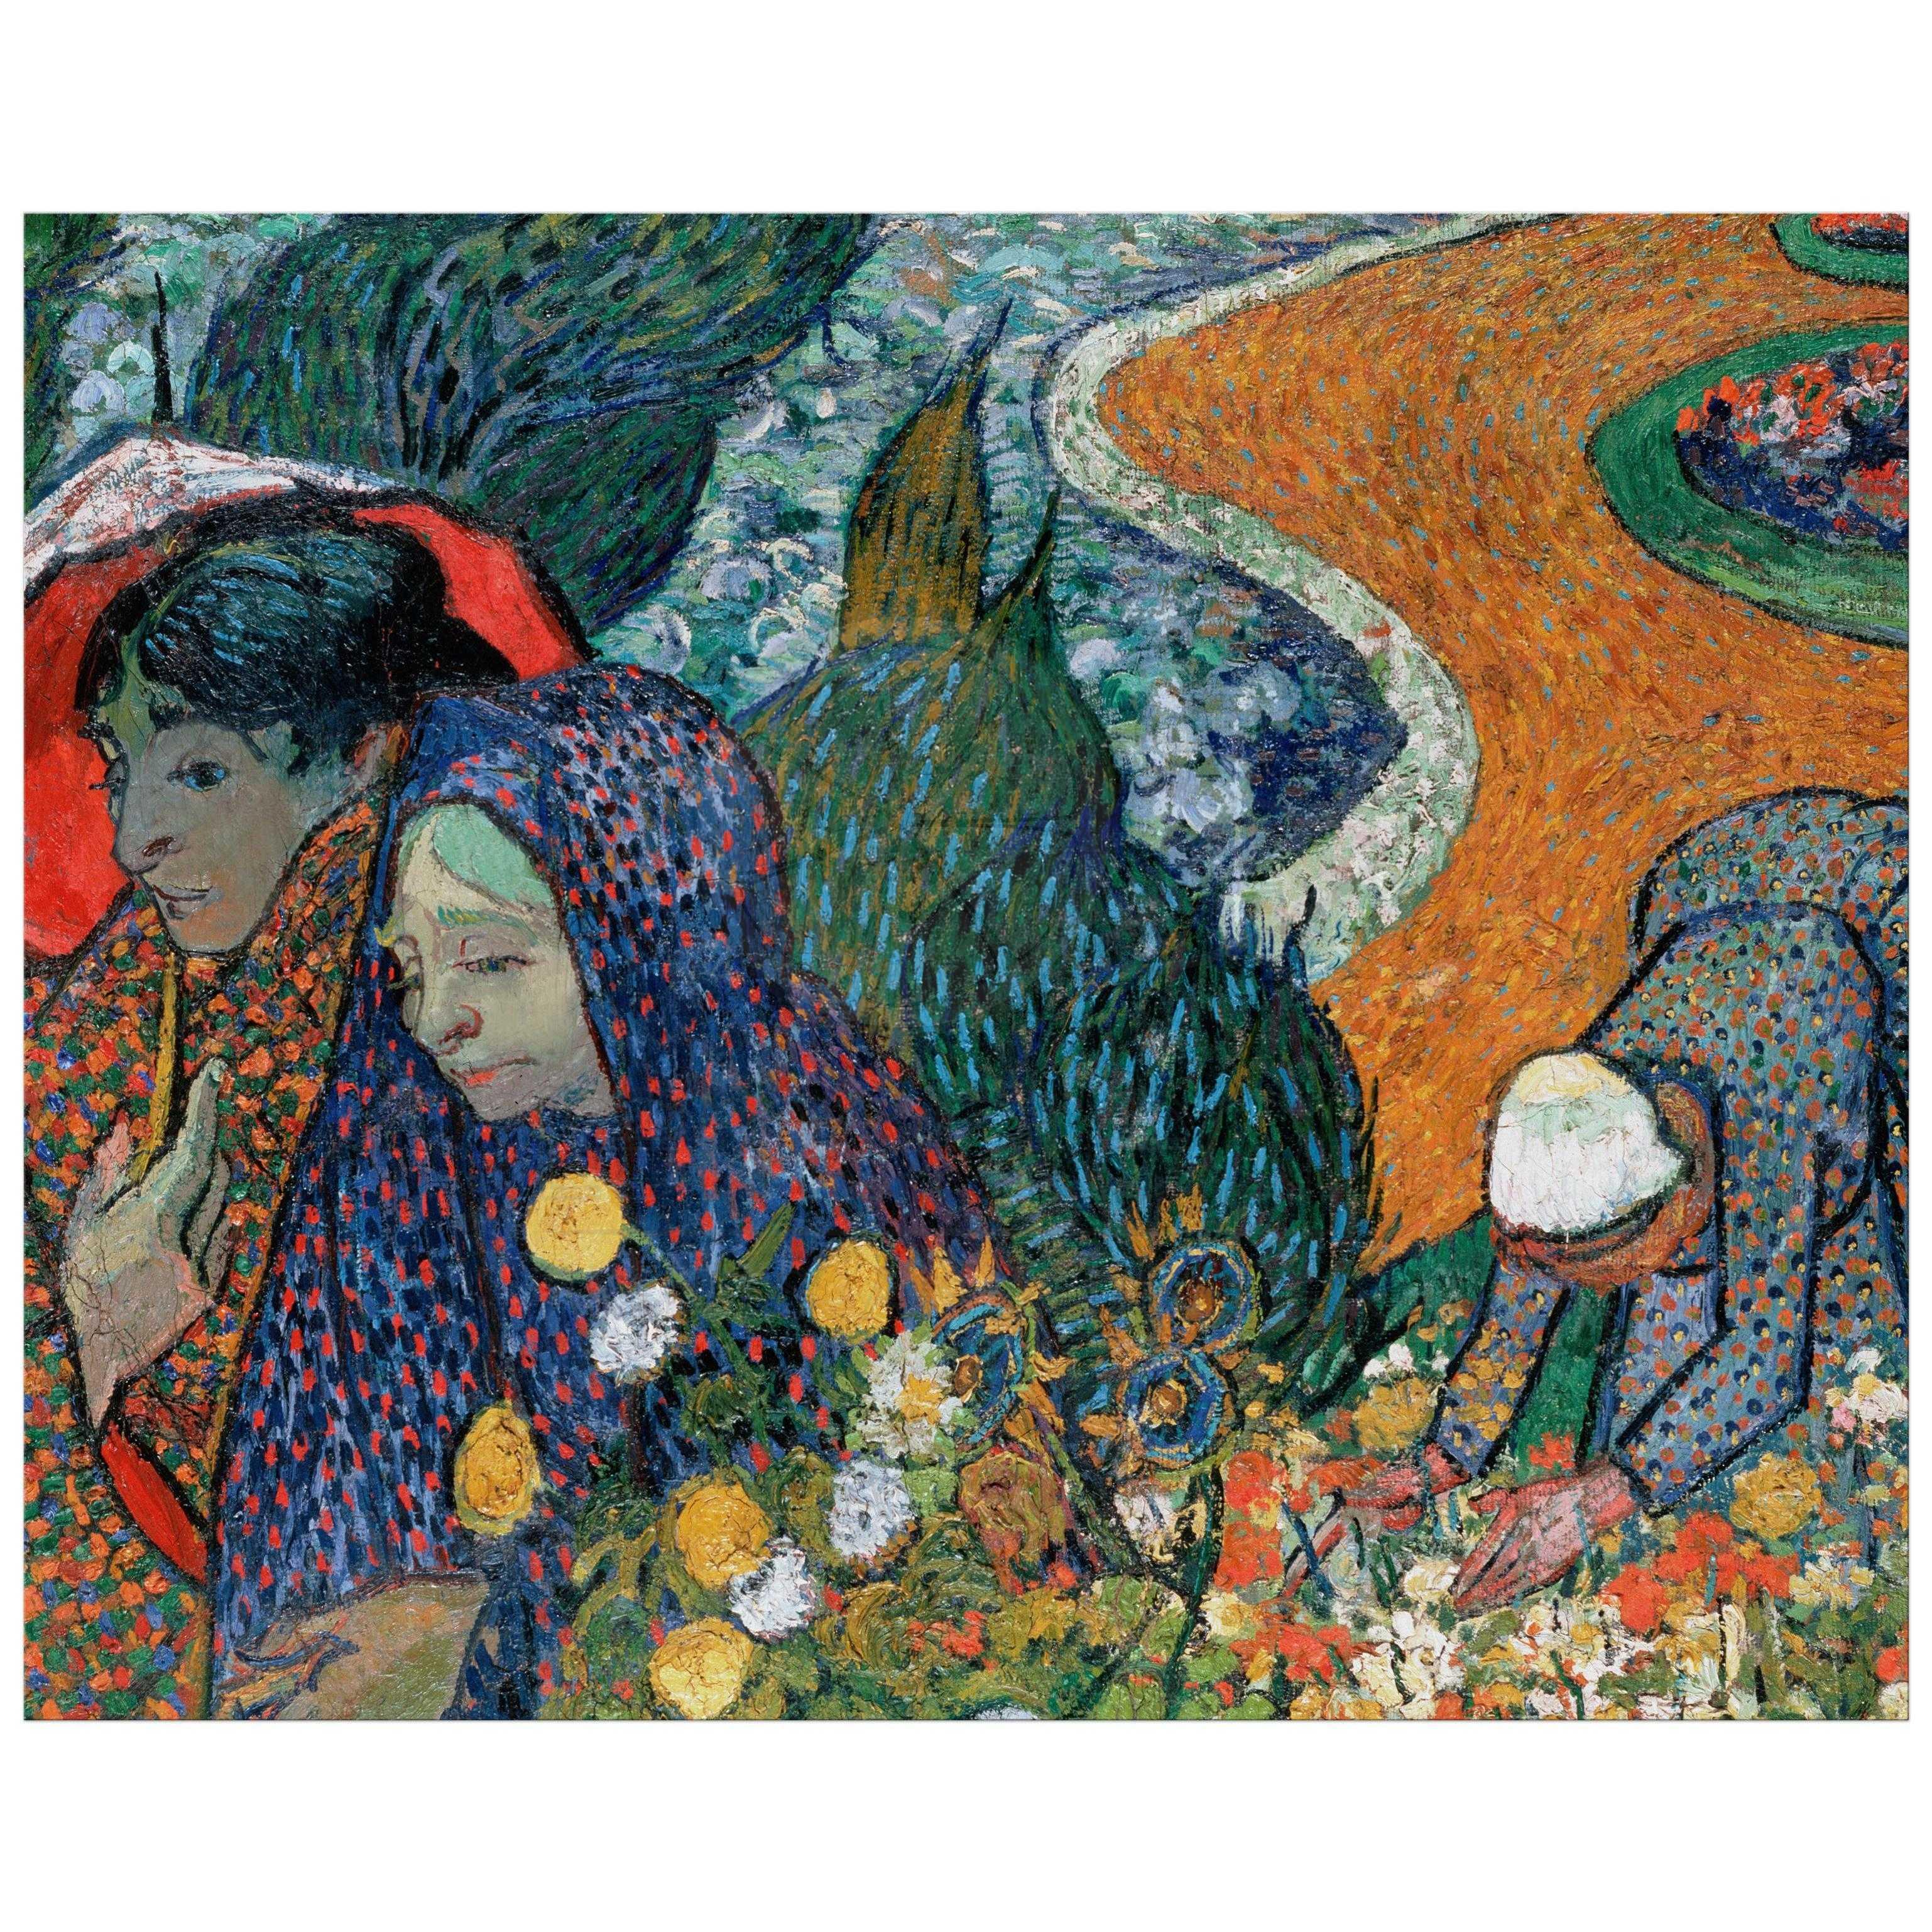 sc 1 st  Lemon Leaf Prints & 8x10 Wall Art Reproduction of Van Goghu0027s Memory of the Garden at Etten